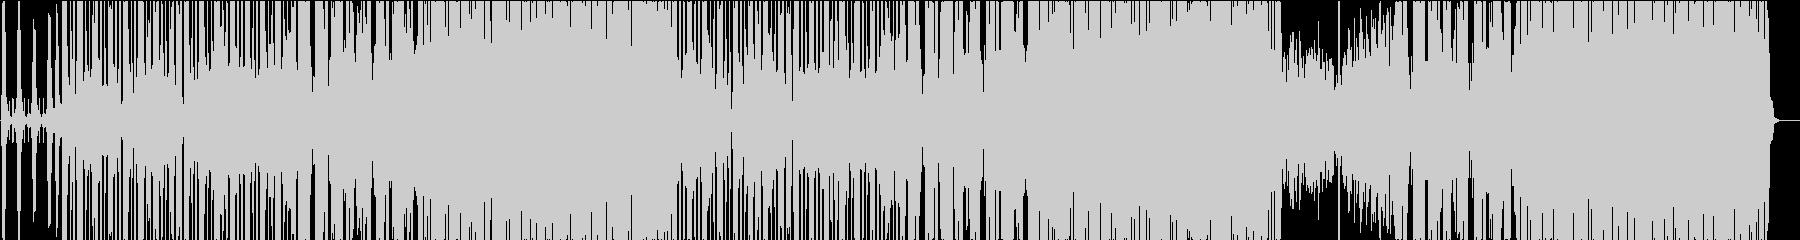 ONE LAST TIME (Prod.AmPm)の未再生の波形